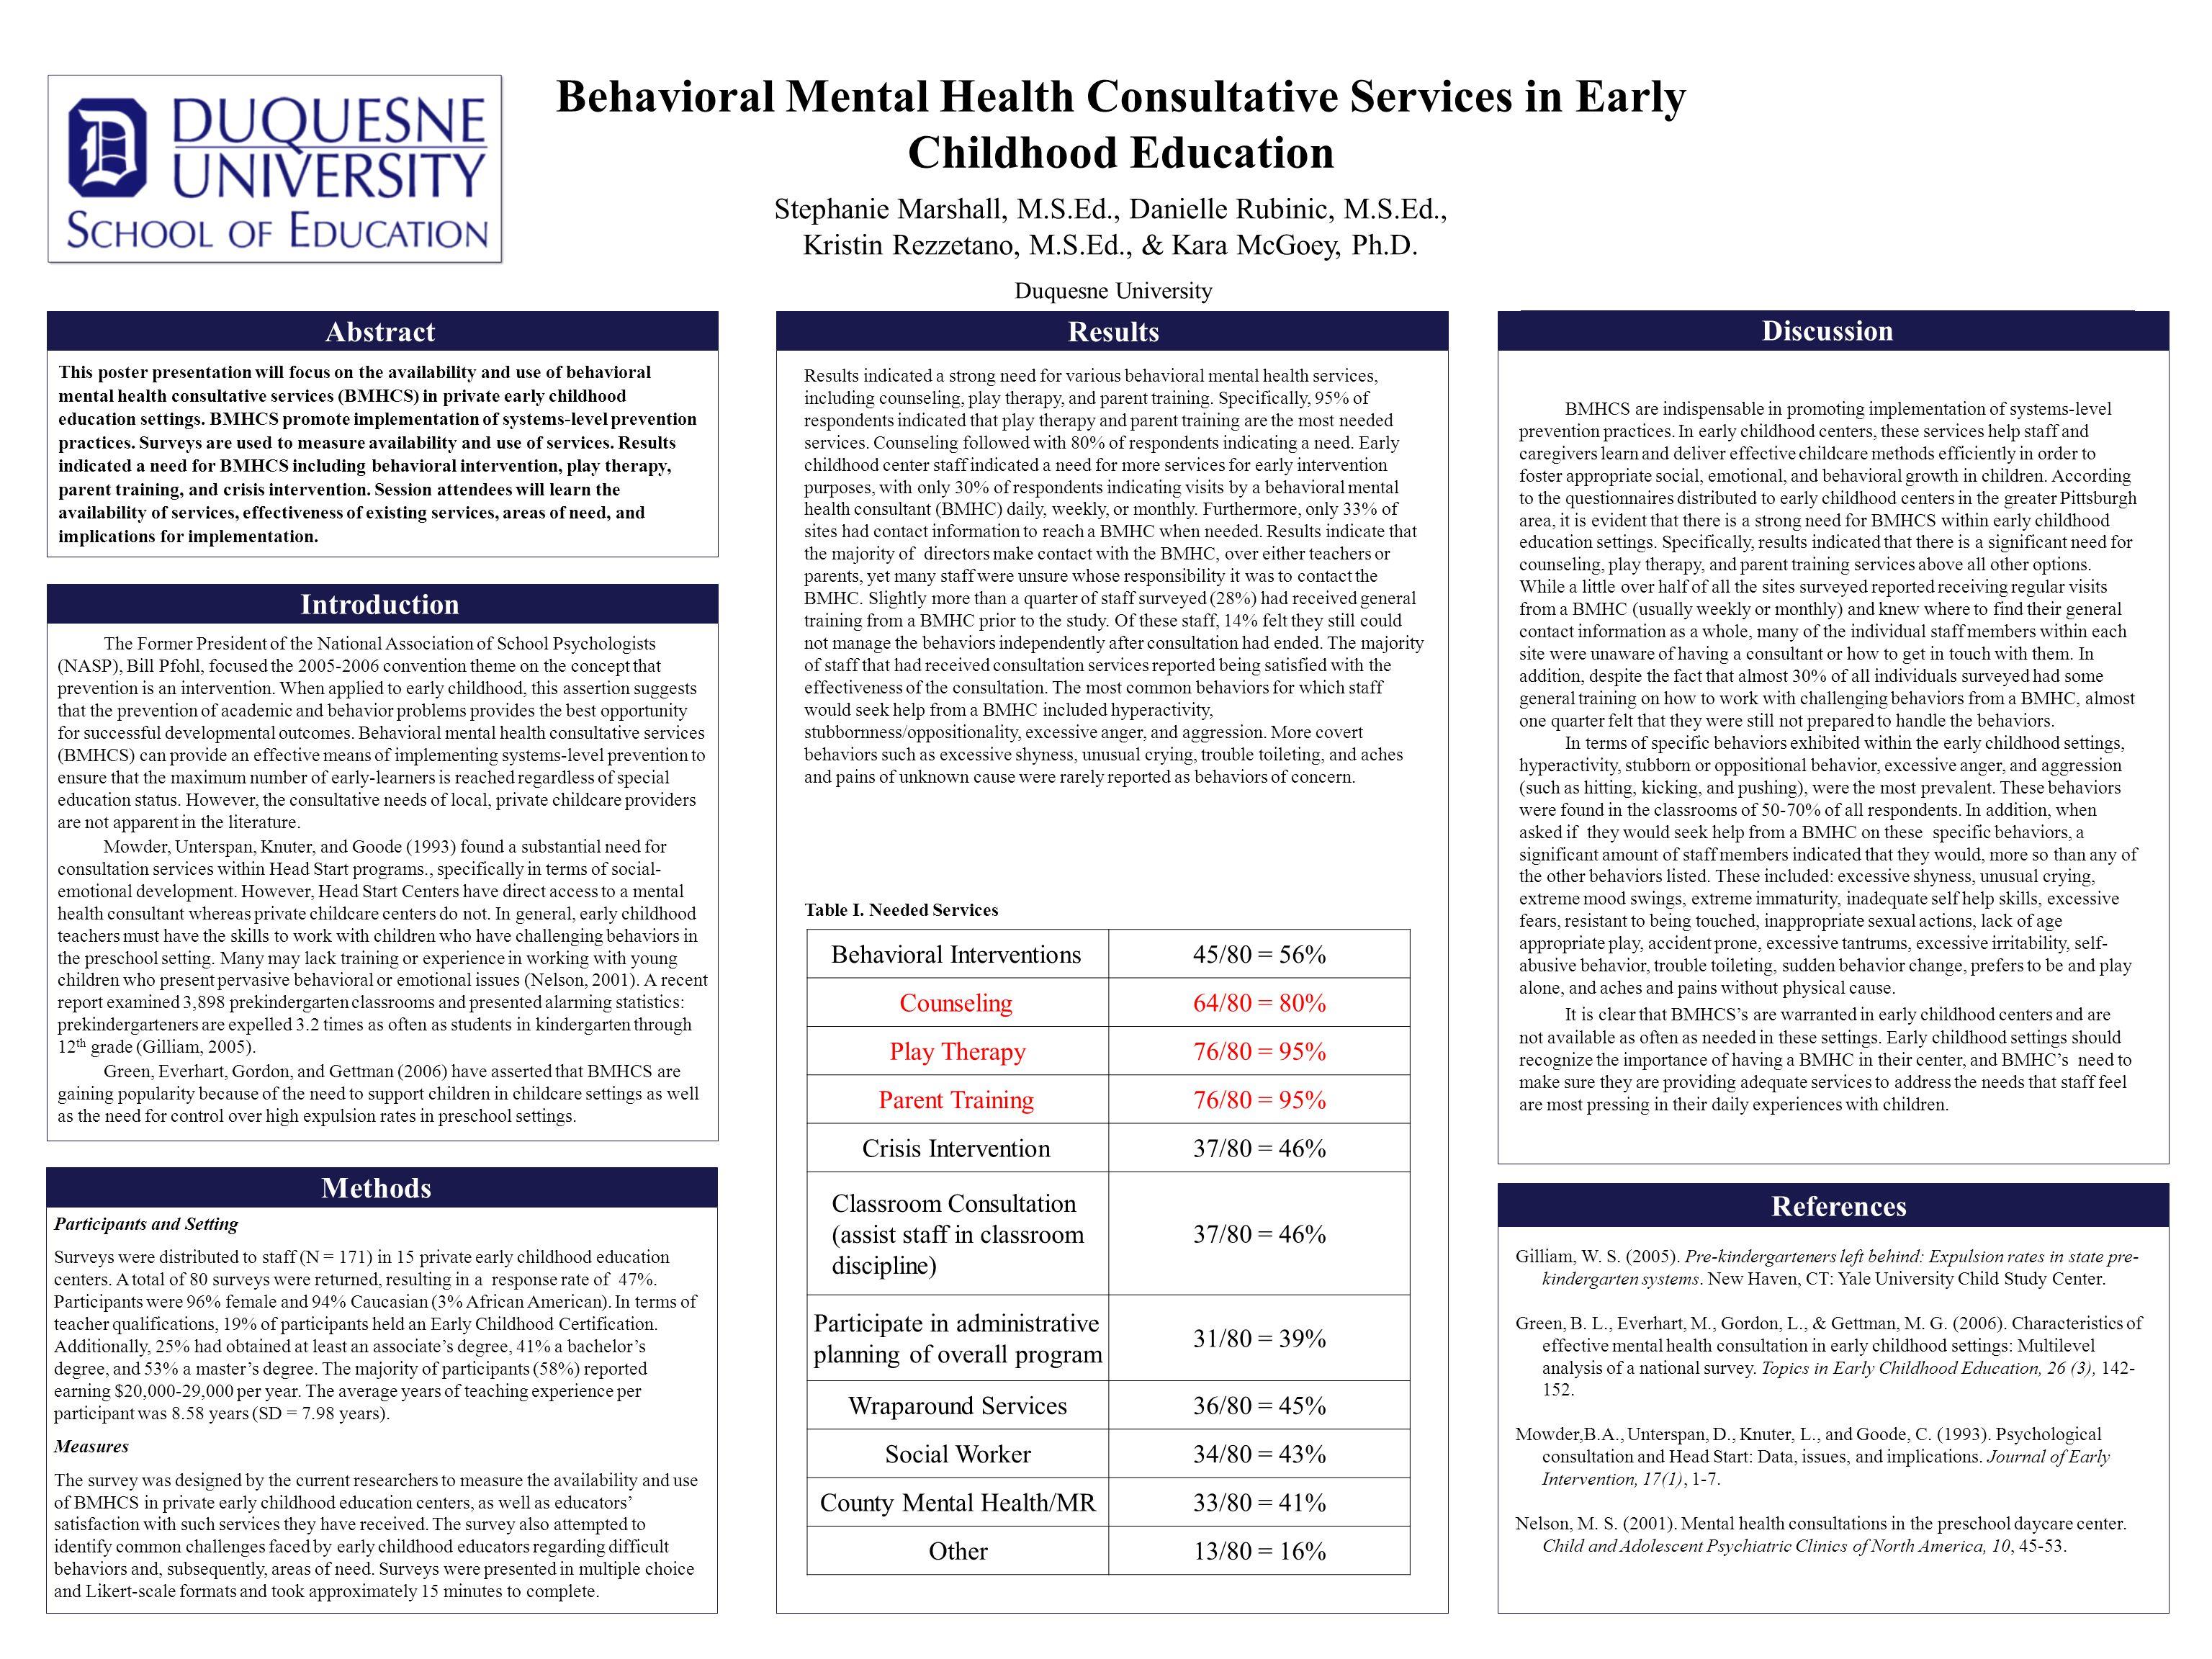 Abstract Stephanie Marshall, M.S.Ed., Danielle Rubinic, M.S.Ed., Kristin Rezzetano, M.S.Ed., & Kara McGoey, Ph.D. Duquesne University This poster pres